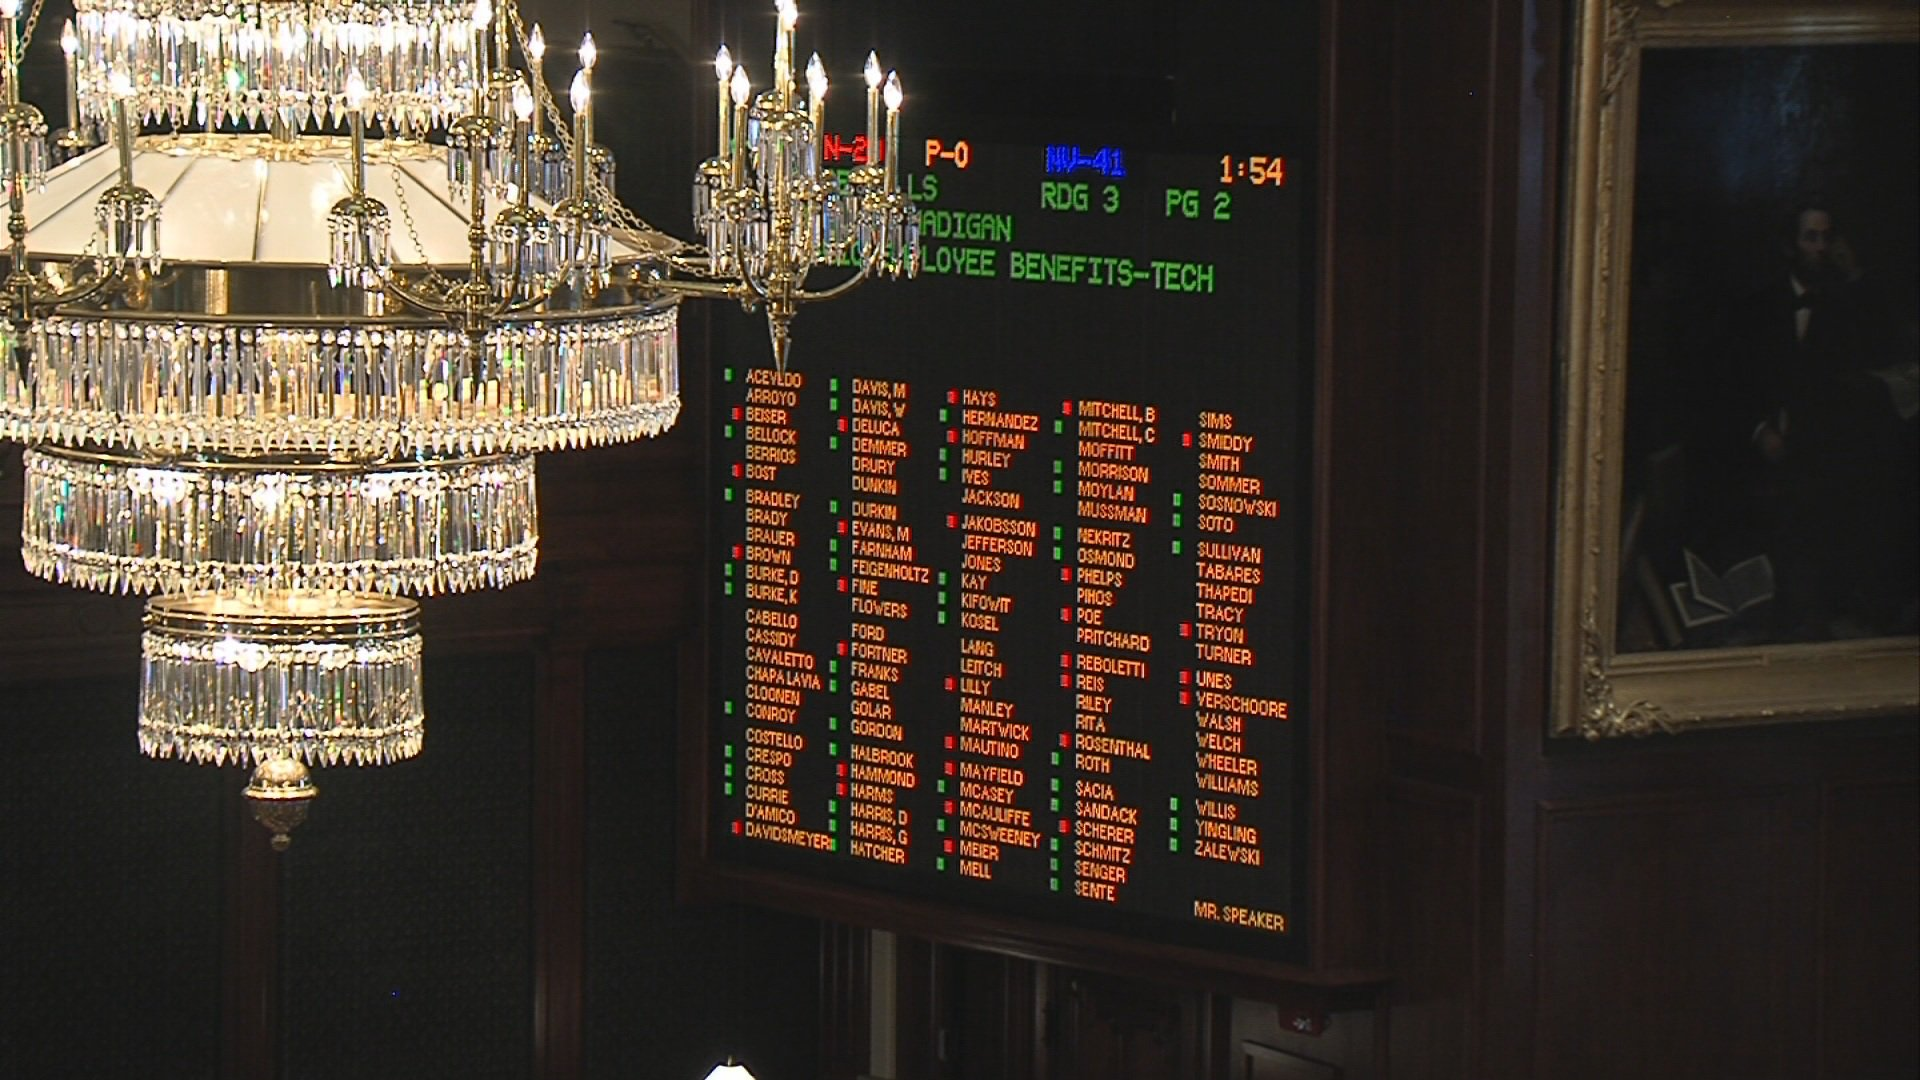 Illinois House Passes Pension Reform - Wandtv.com, NewsCenter17